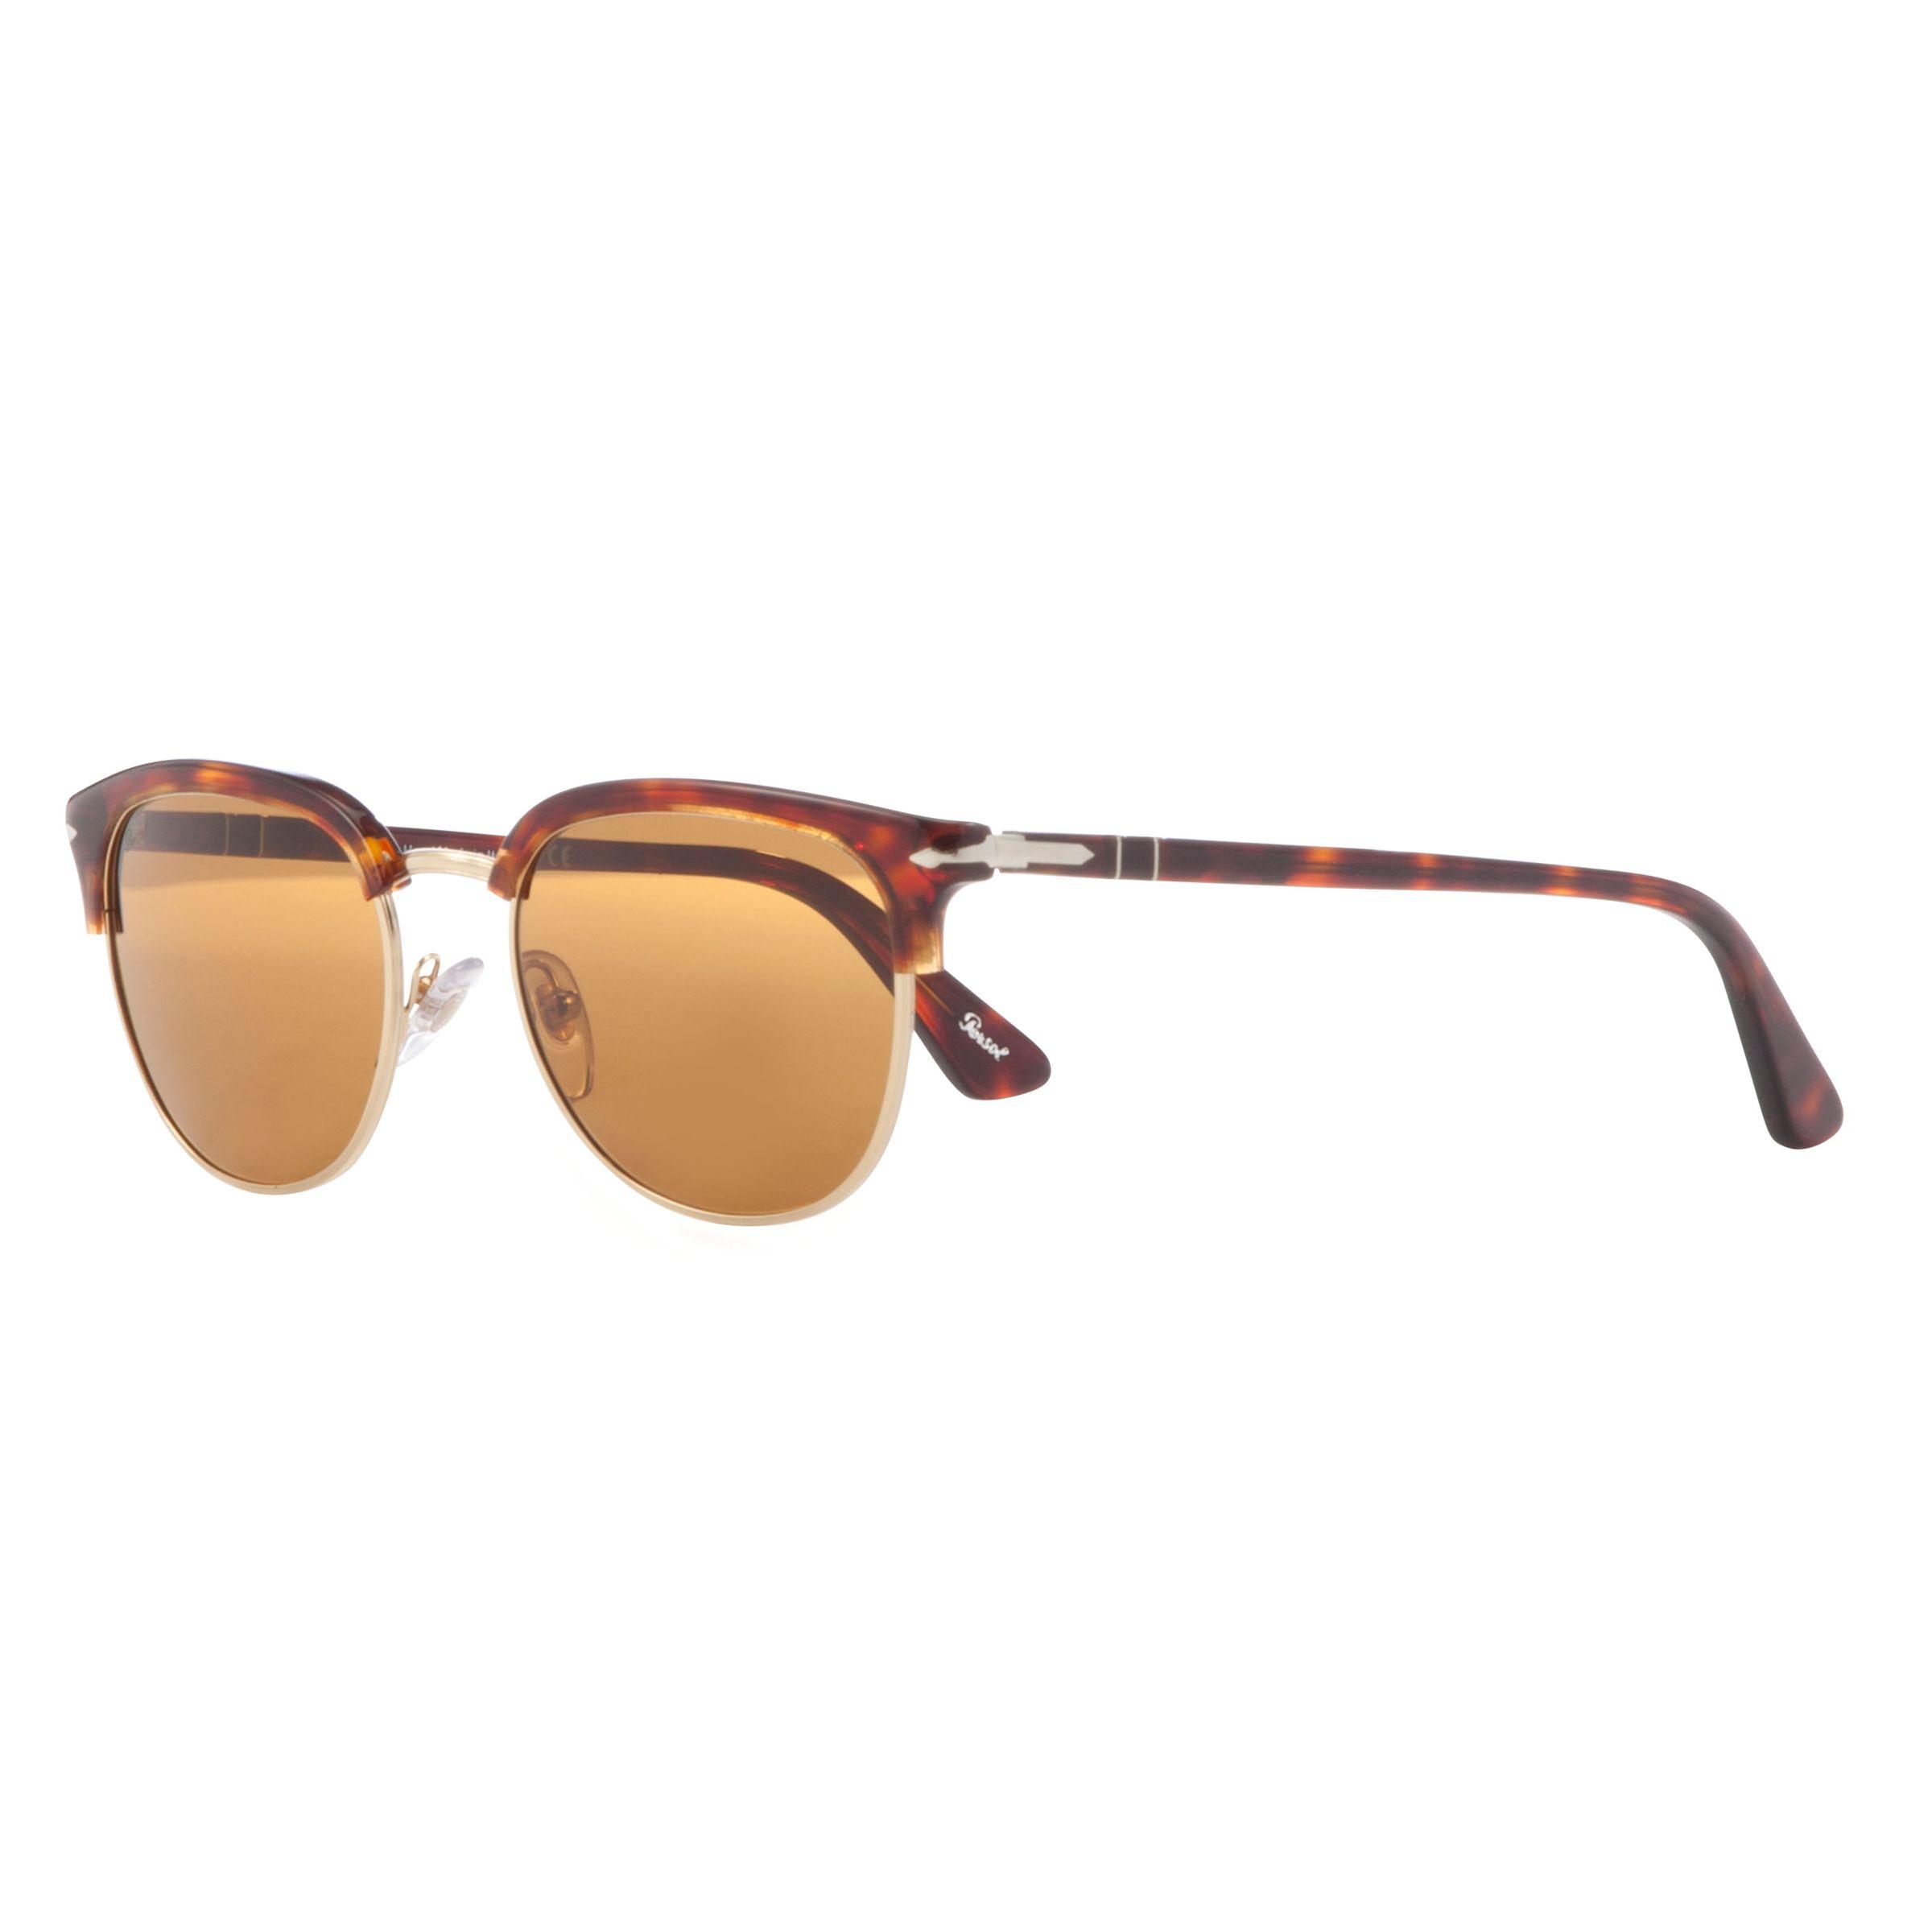 Persol Persol PO3105S D-Frame Sunglasses, Havana